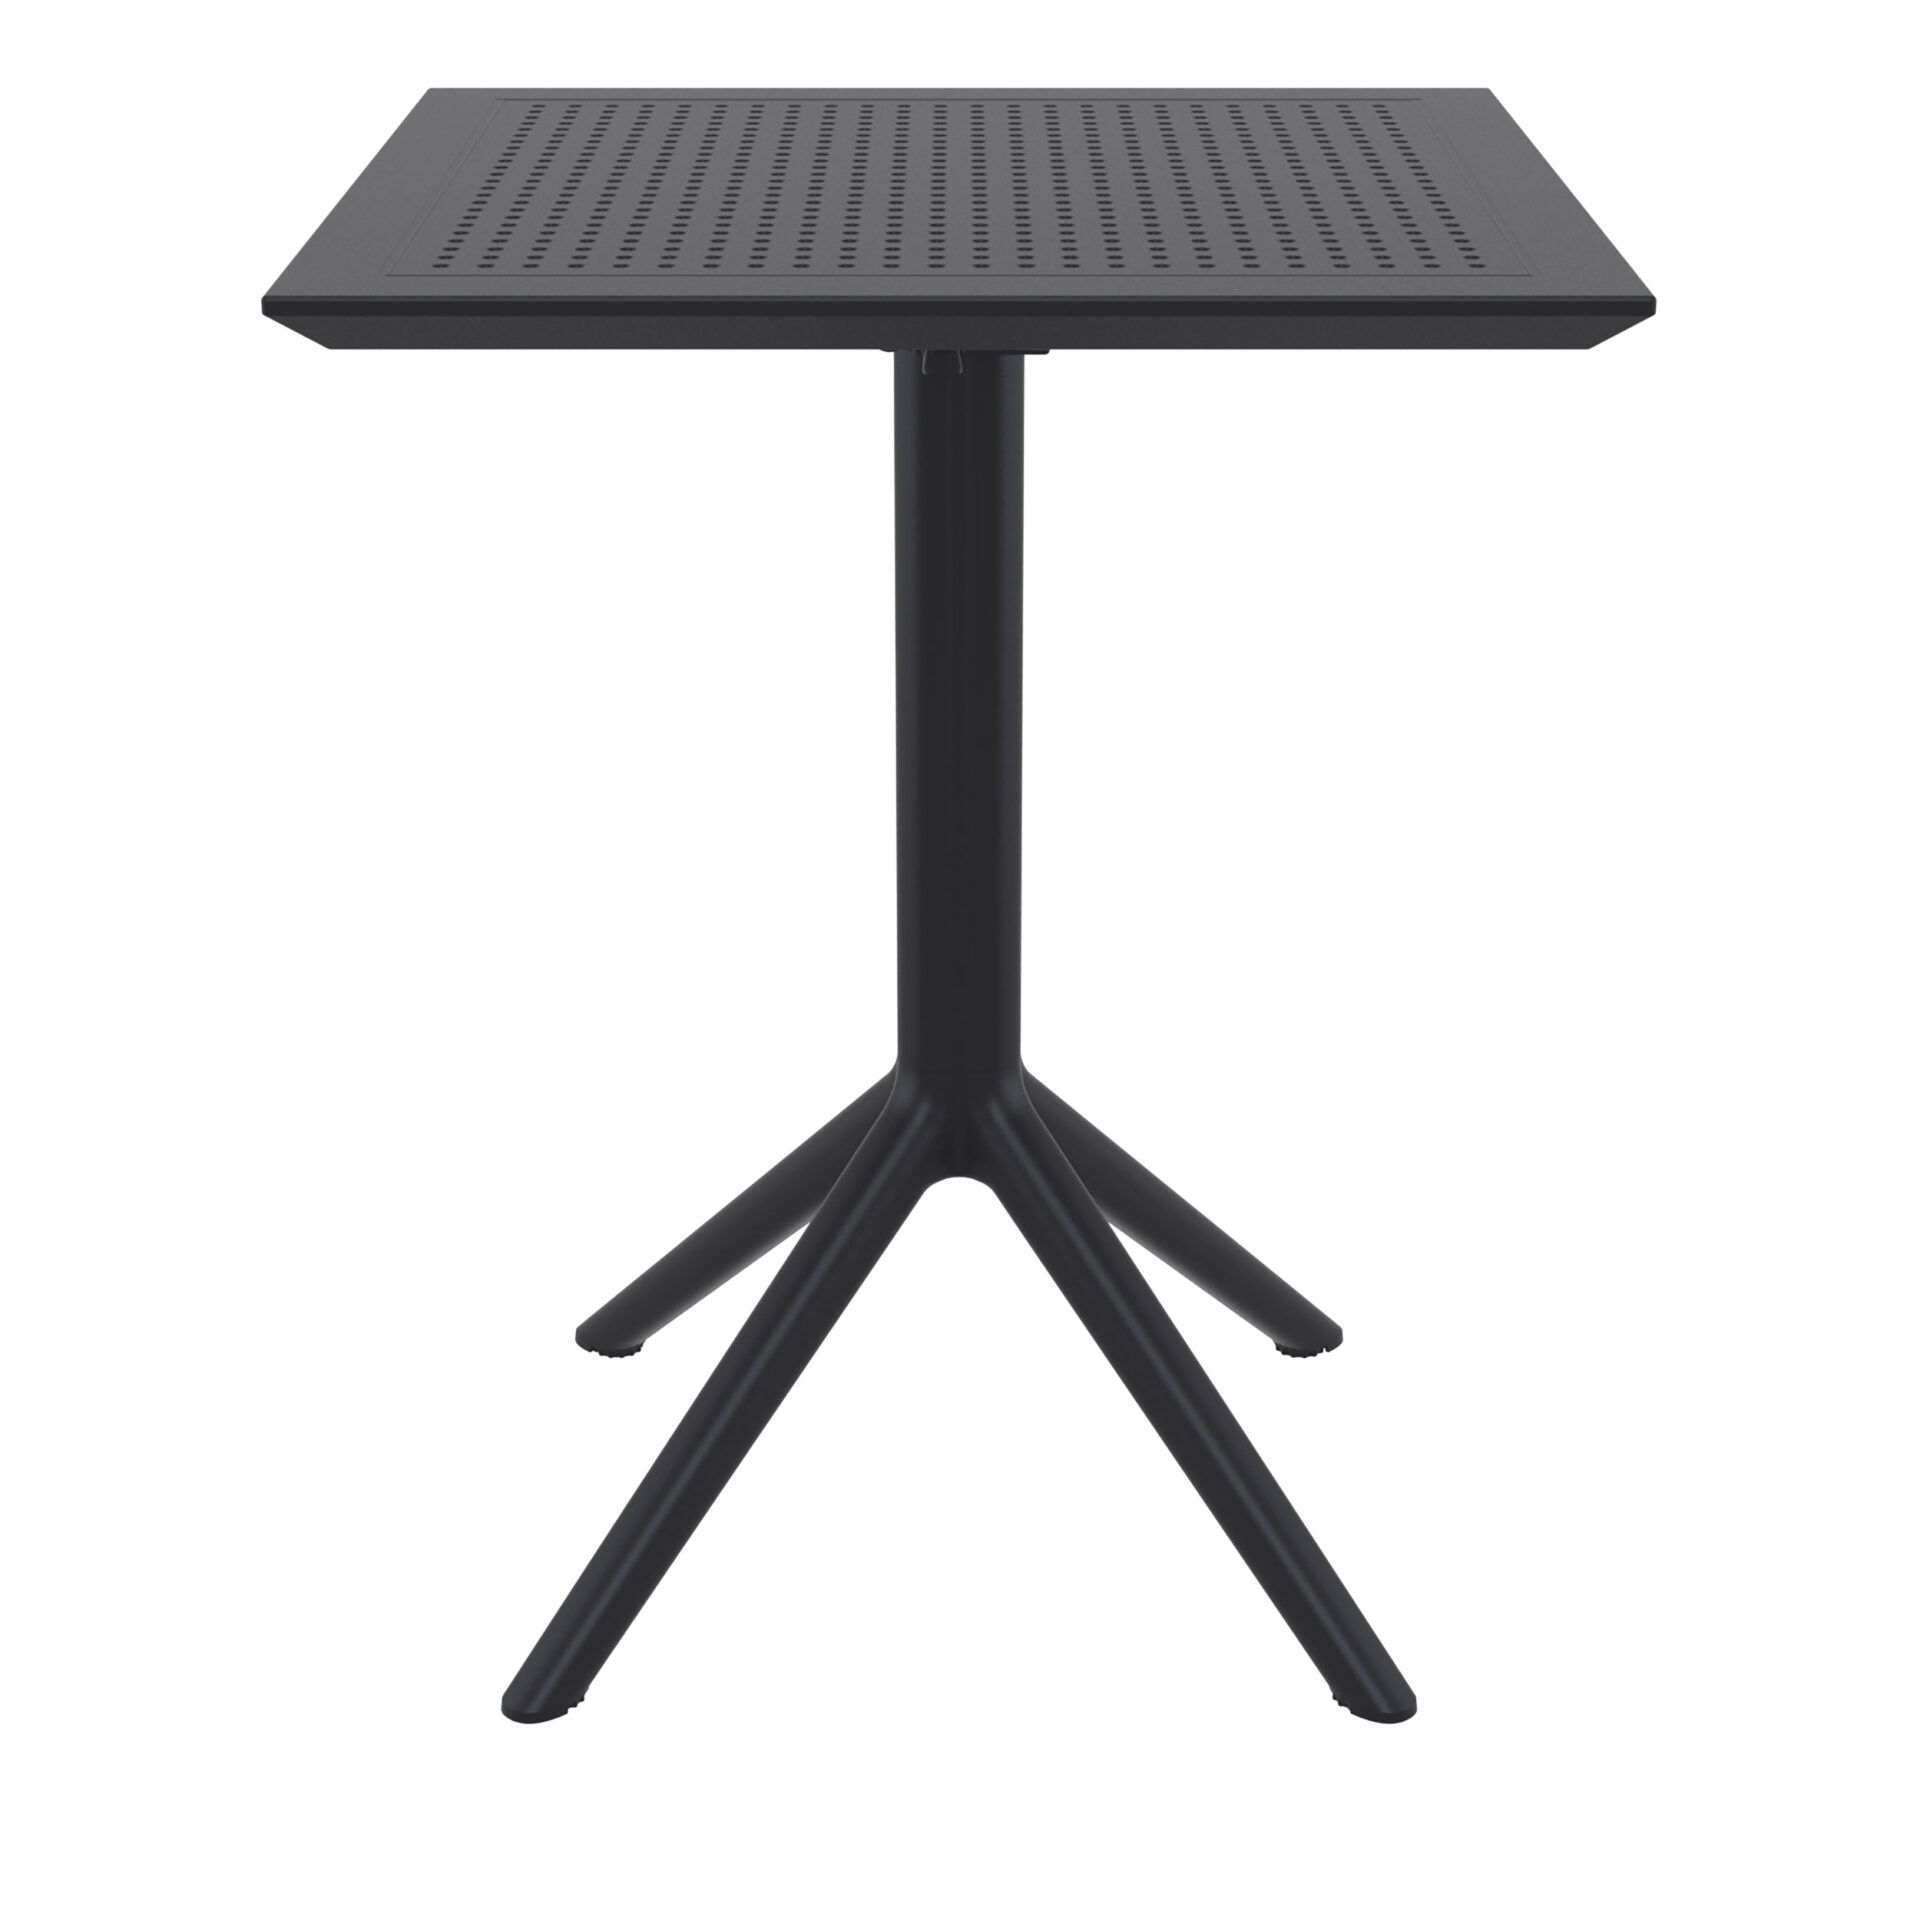 polypropylene outdoor sky folding bar table 60 black front